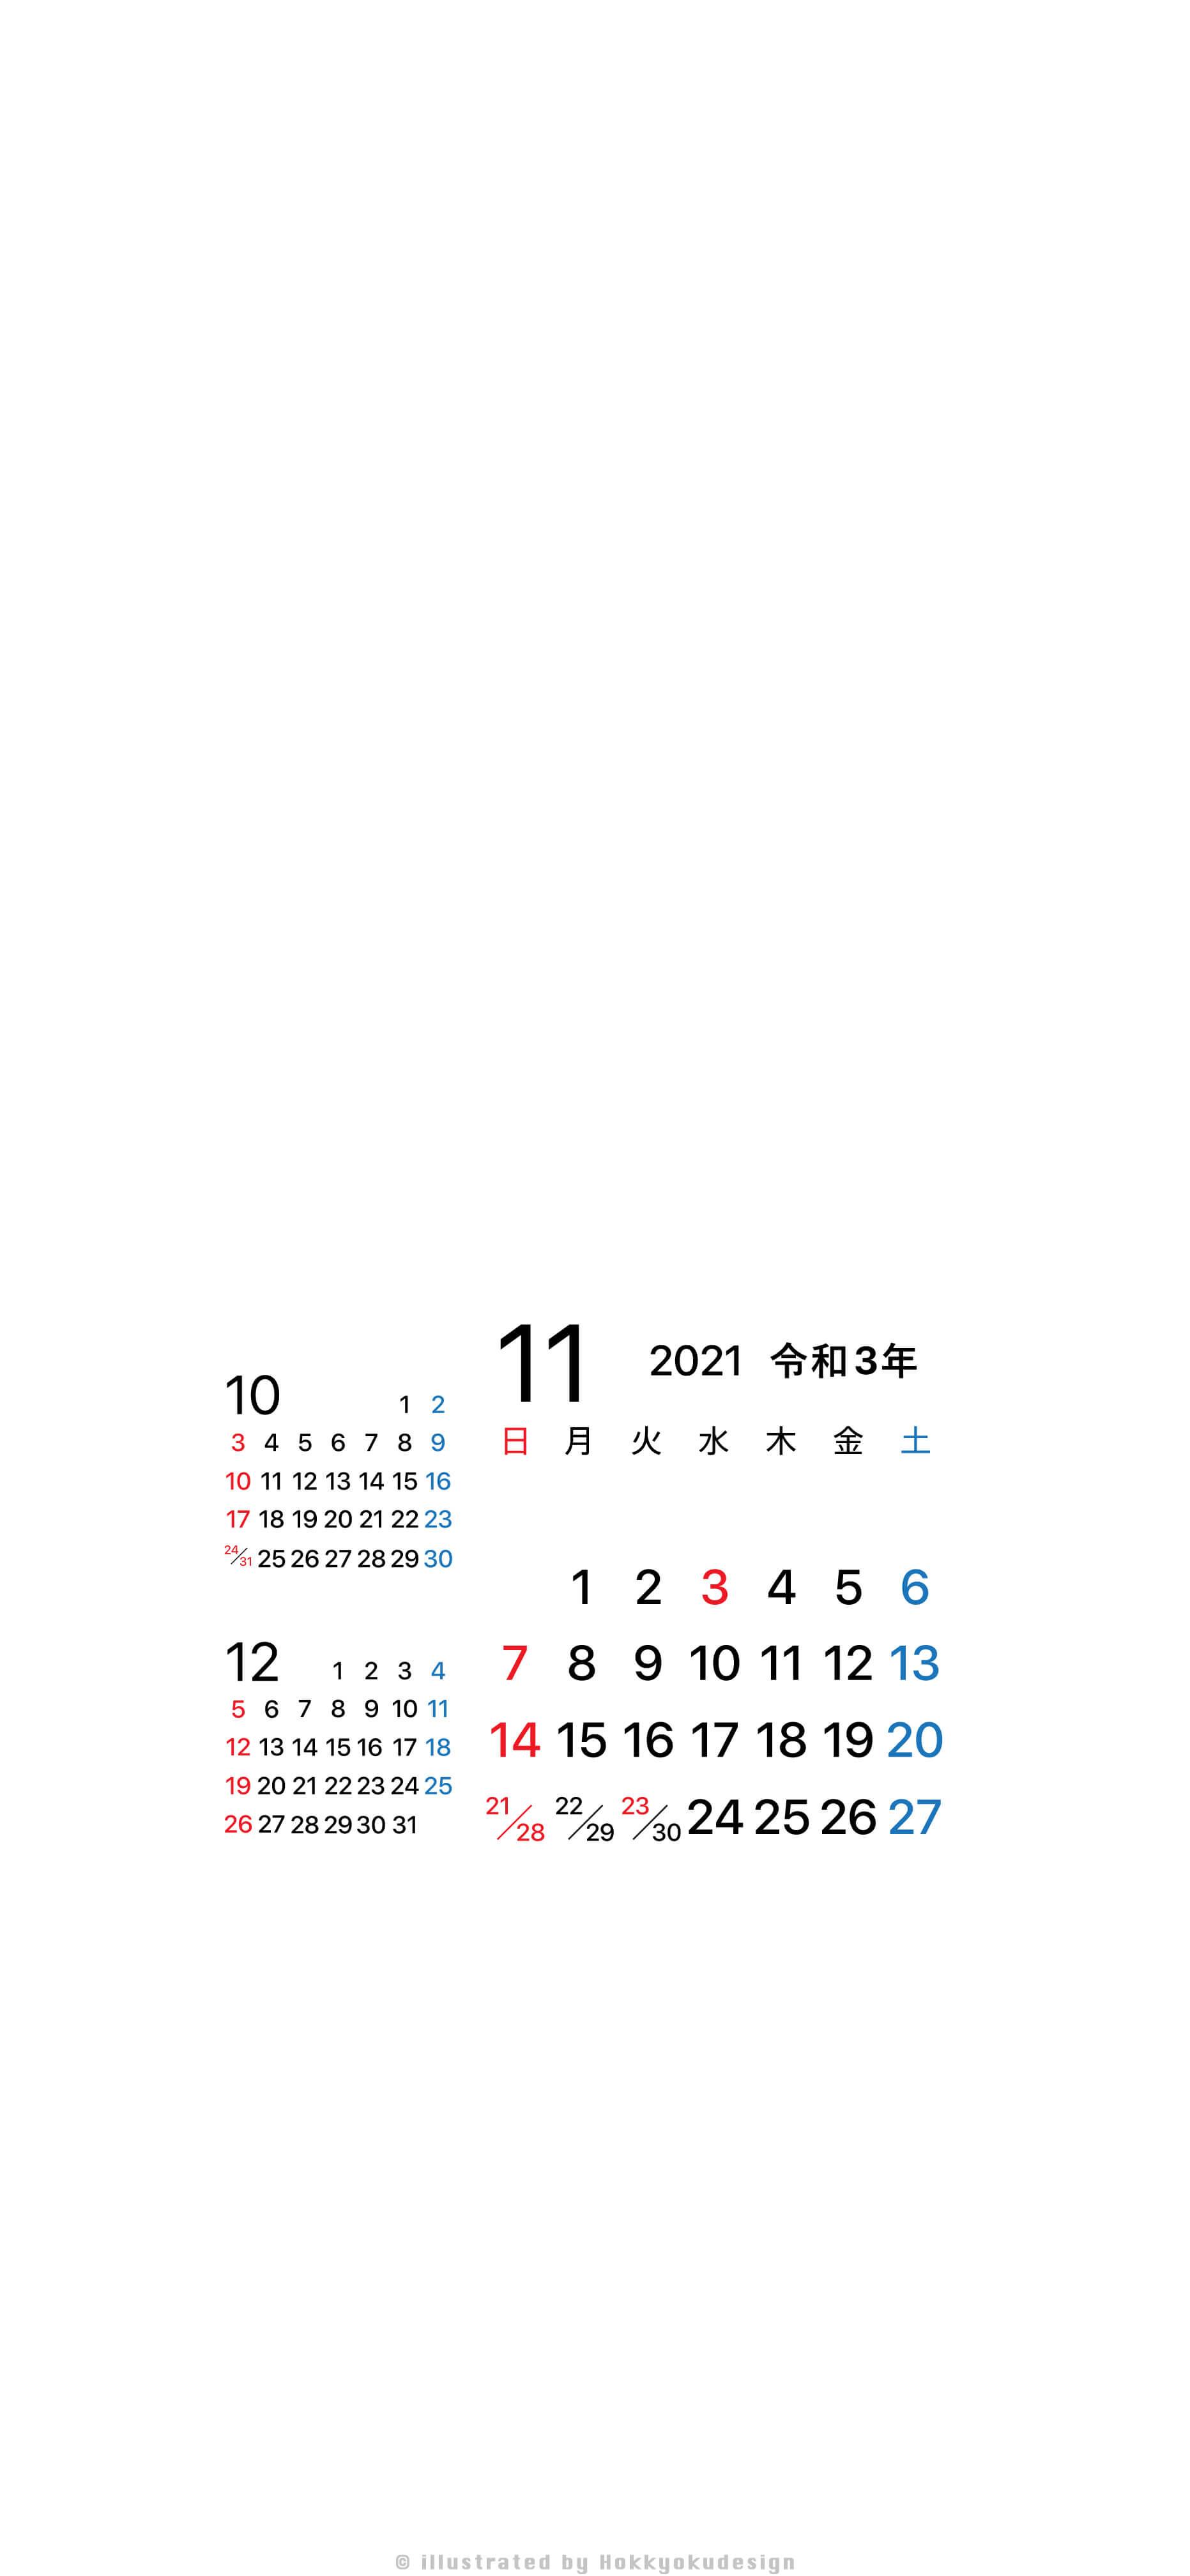 Iphone11 11pro 11pro Max Xs Xs Max Xr X カレンダー壁紙 ホワイト